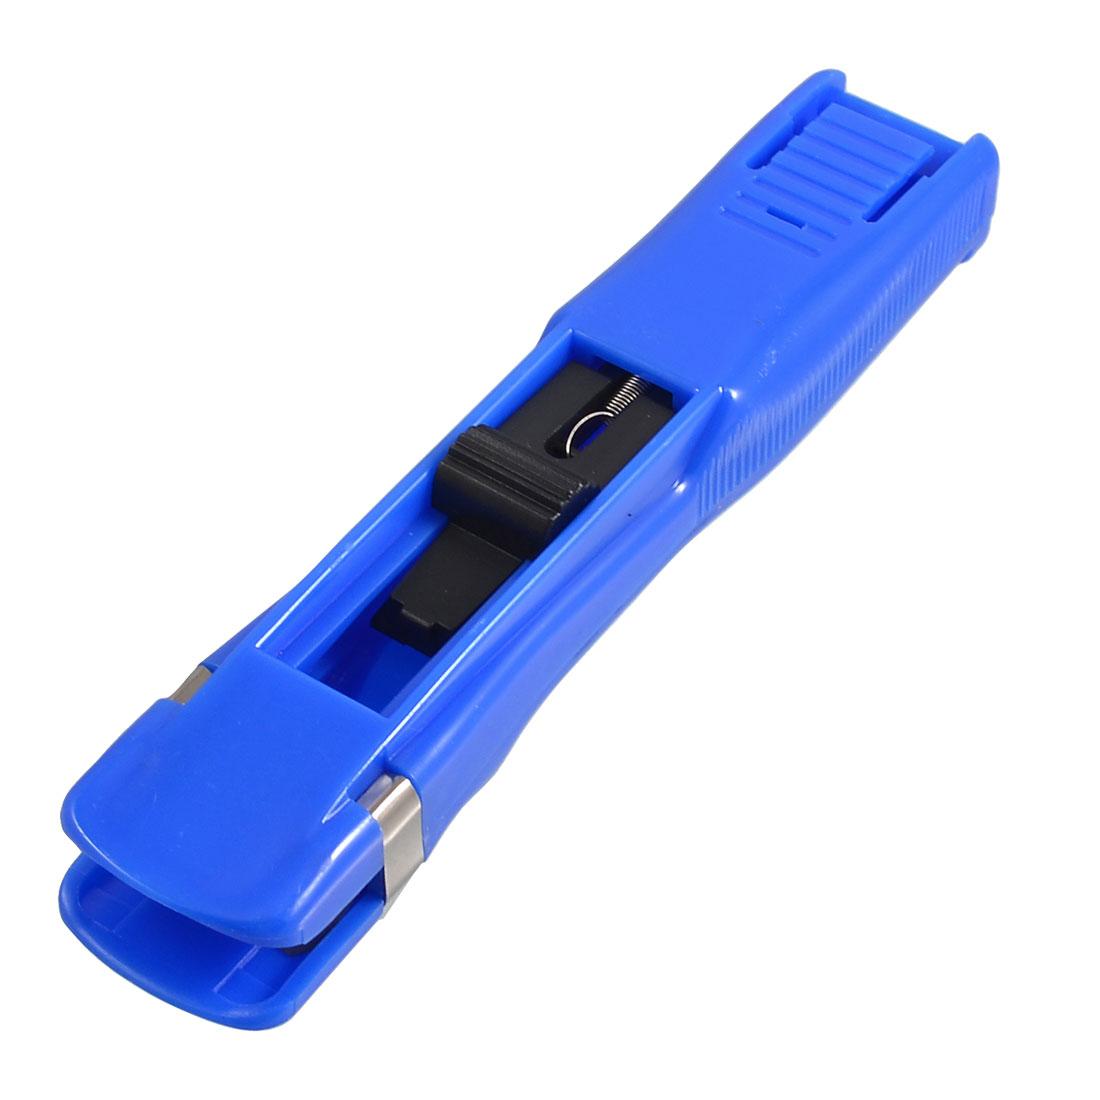 Blue Plastic Handheld Student Stationery Paper Fast Clam Clip Stapler Dispenser